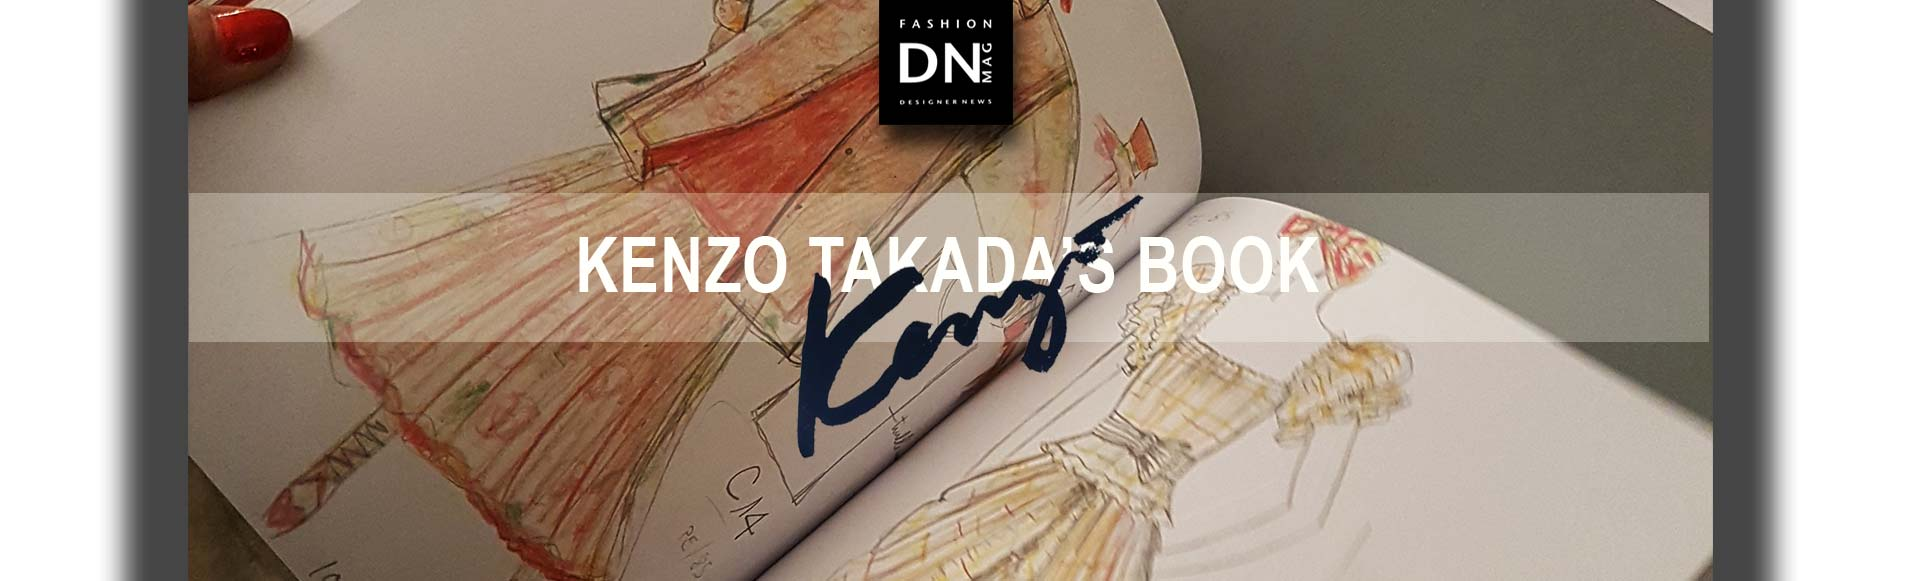 DNMAG-KENZO-TAKADA-BOOK-SIGNATURE